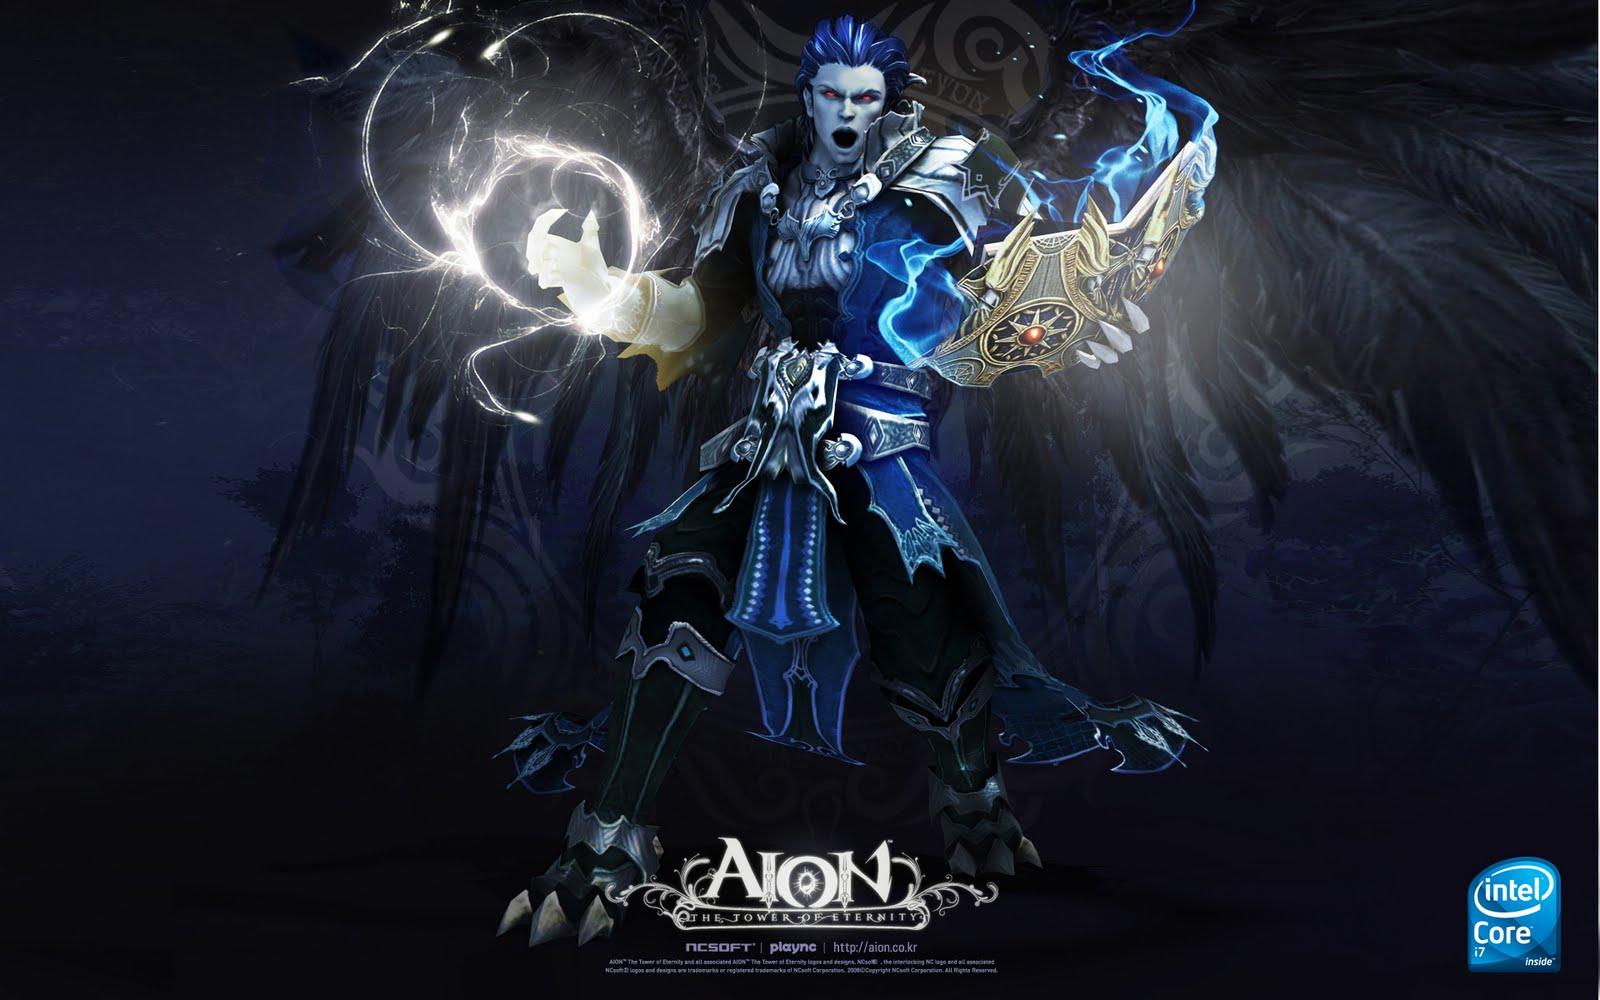 http://4.bp.blogspot.com/-NckrL2YTXLI/TaJWwxTCzhI/AAAAAAAABQg/3BlAew9T3dg/s1600/AION-Wallpaper-Screenshot-PC-Game-Online-10.jpg